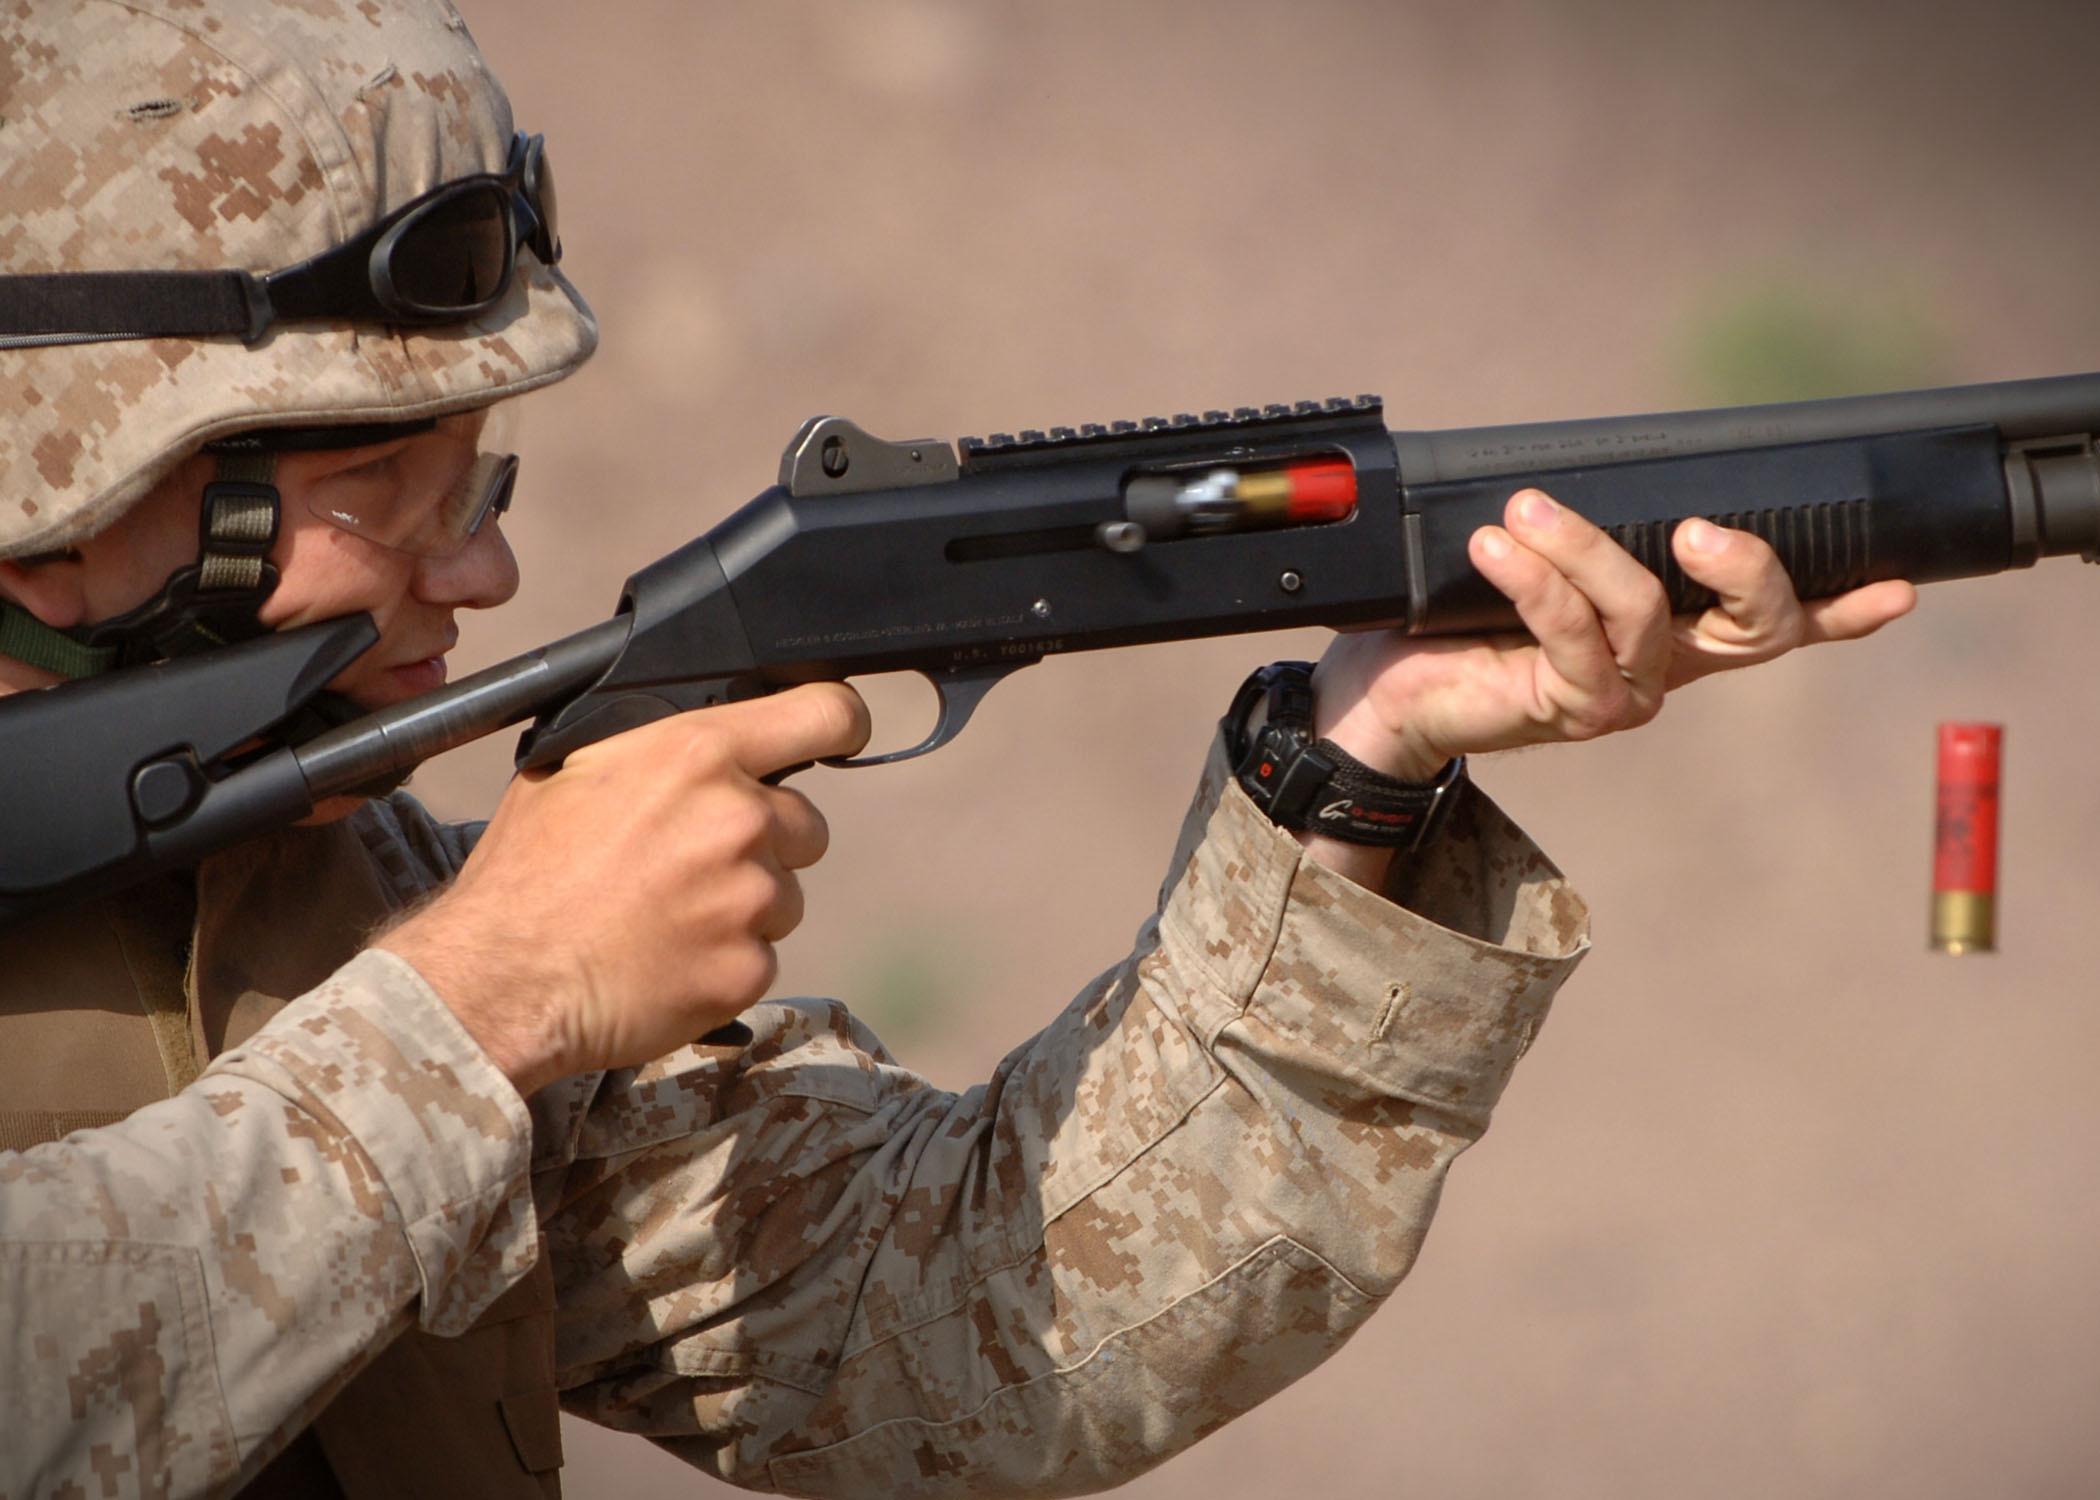 Shotgun_in_training_US_military.jpg